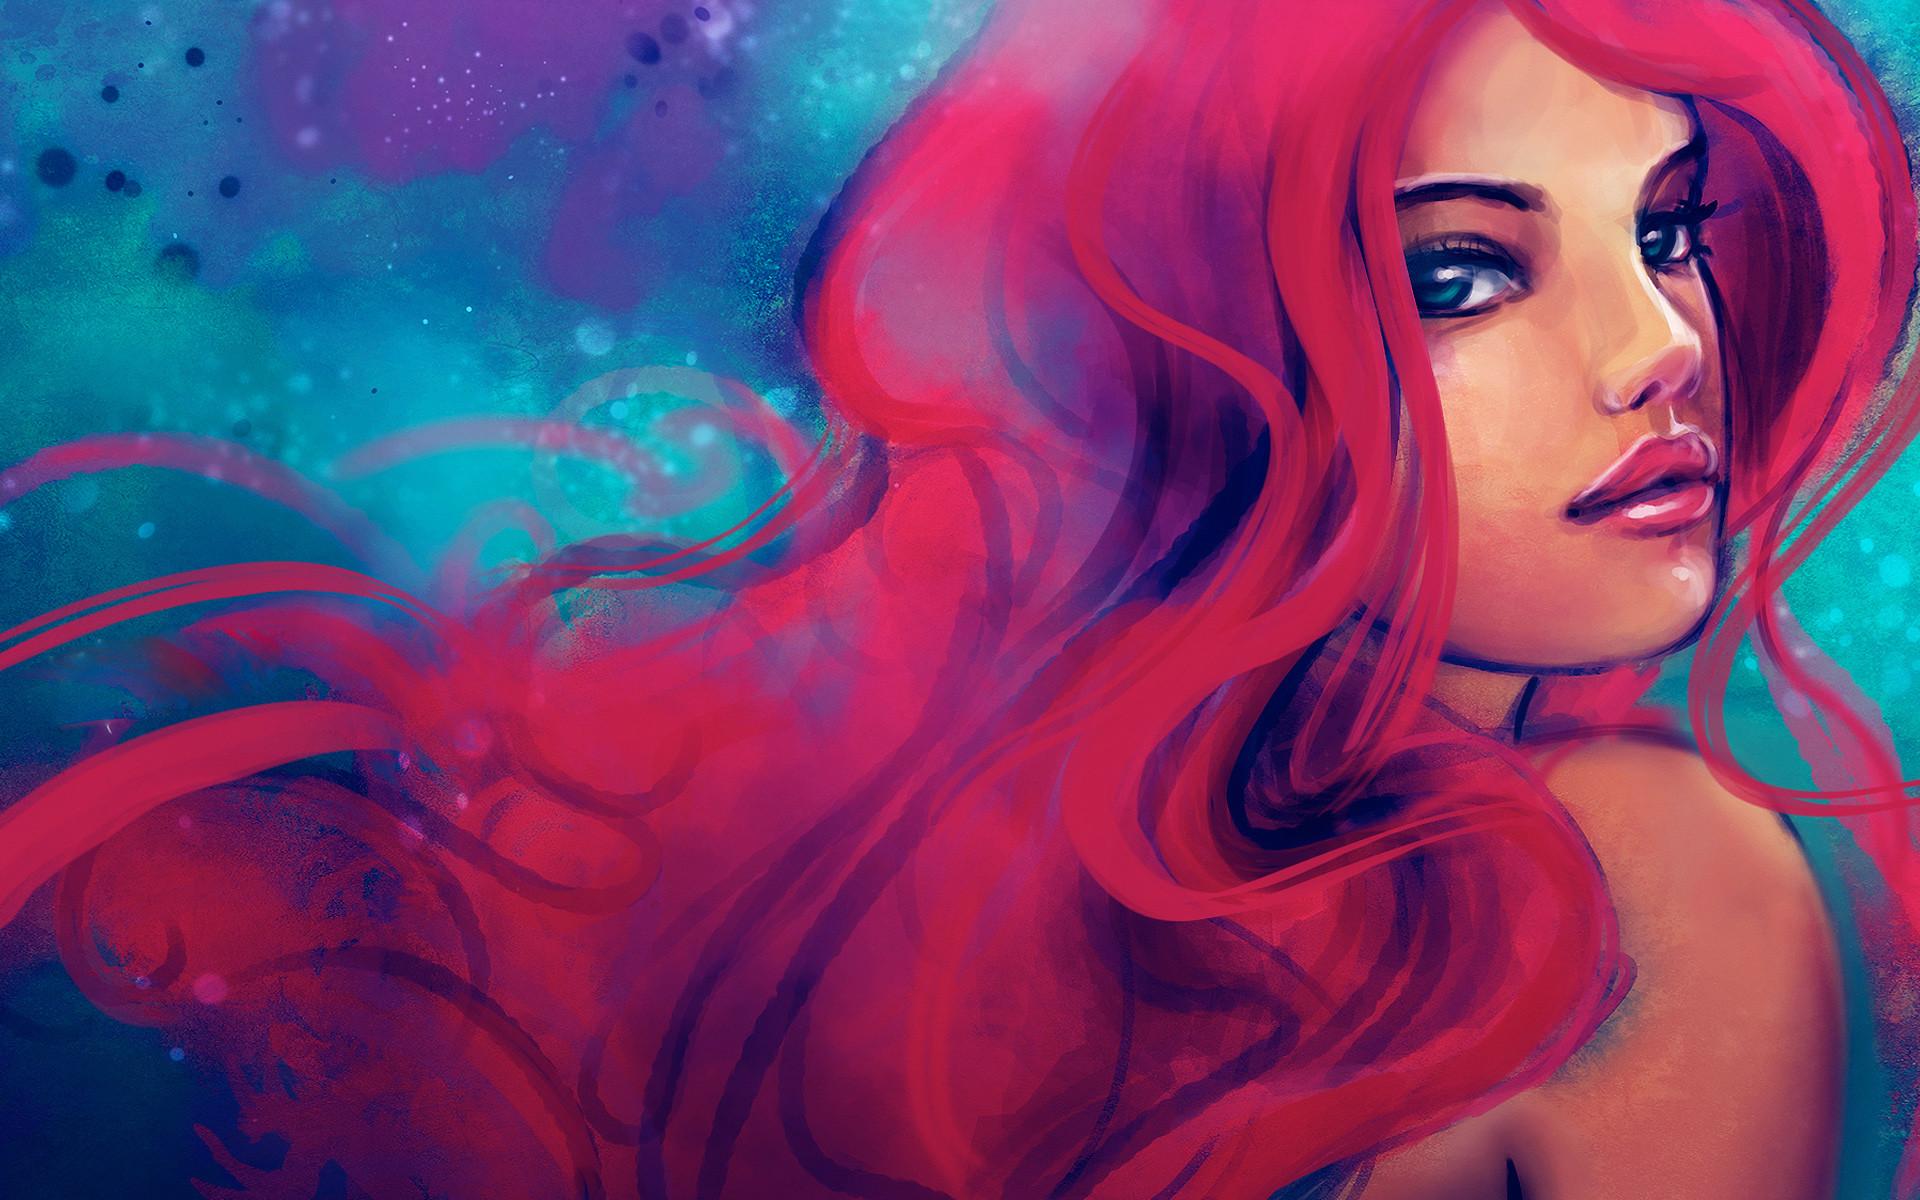 Free Desktop Mermaid Wallpapers Images Download.